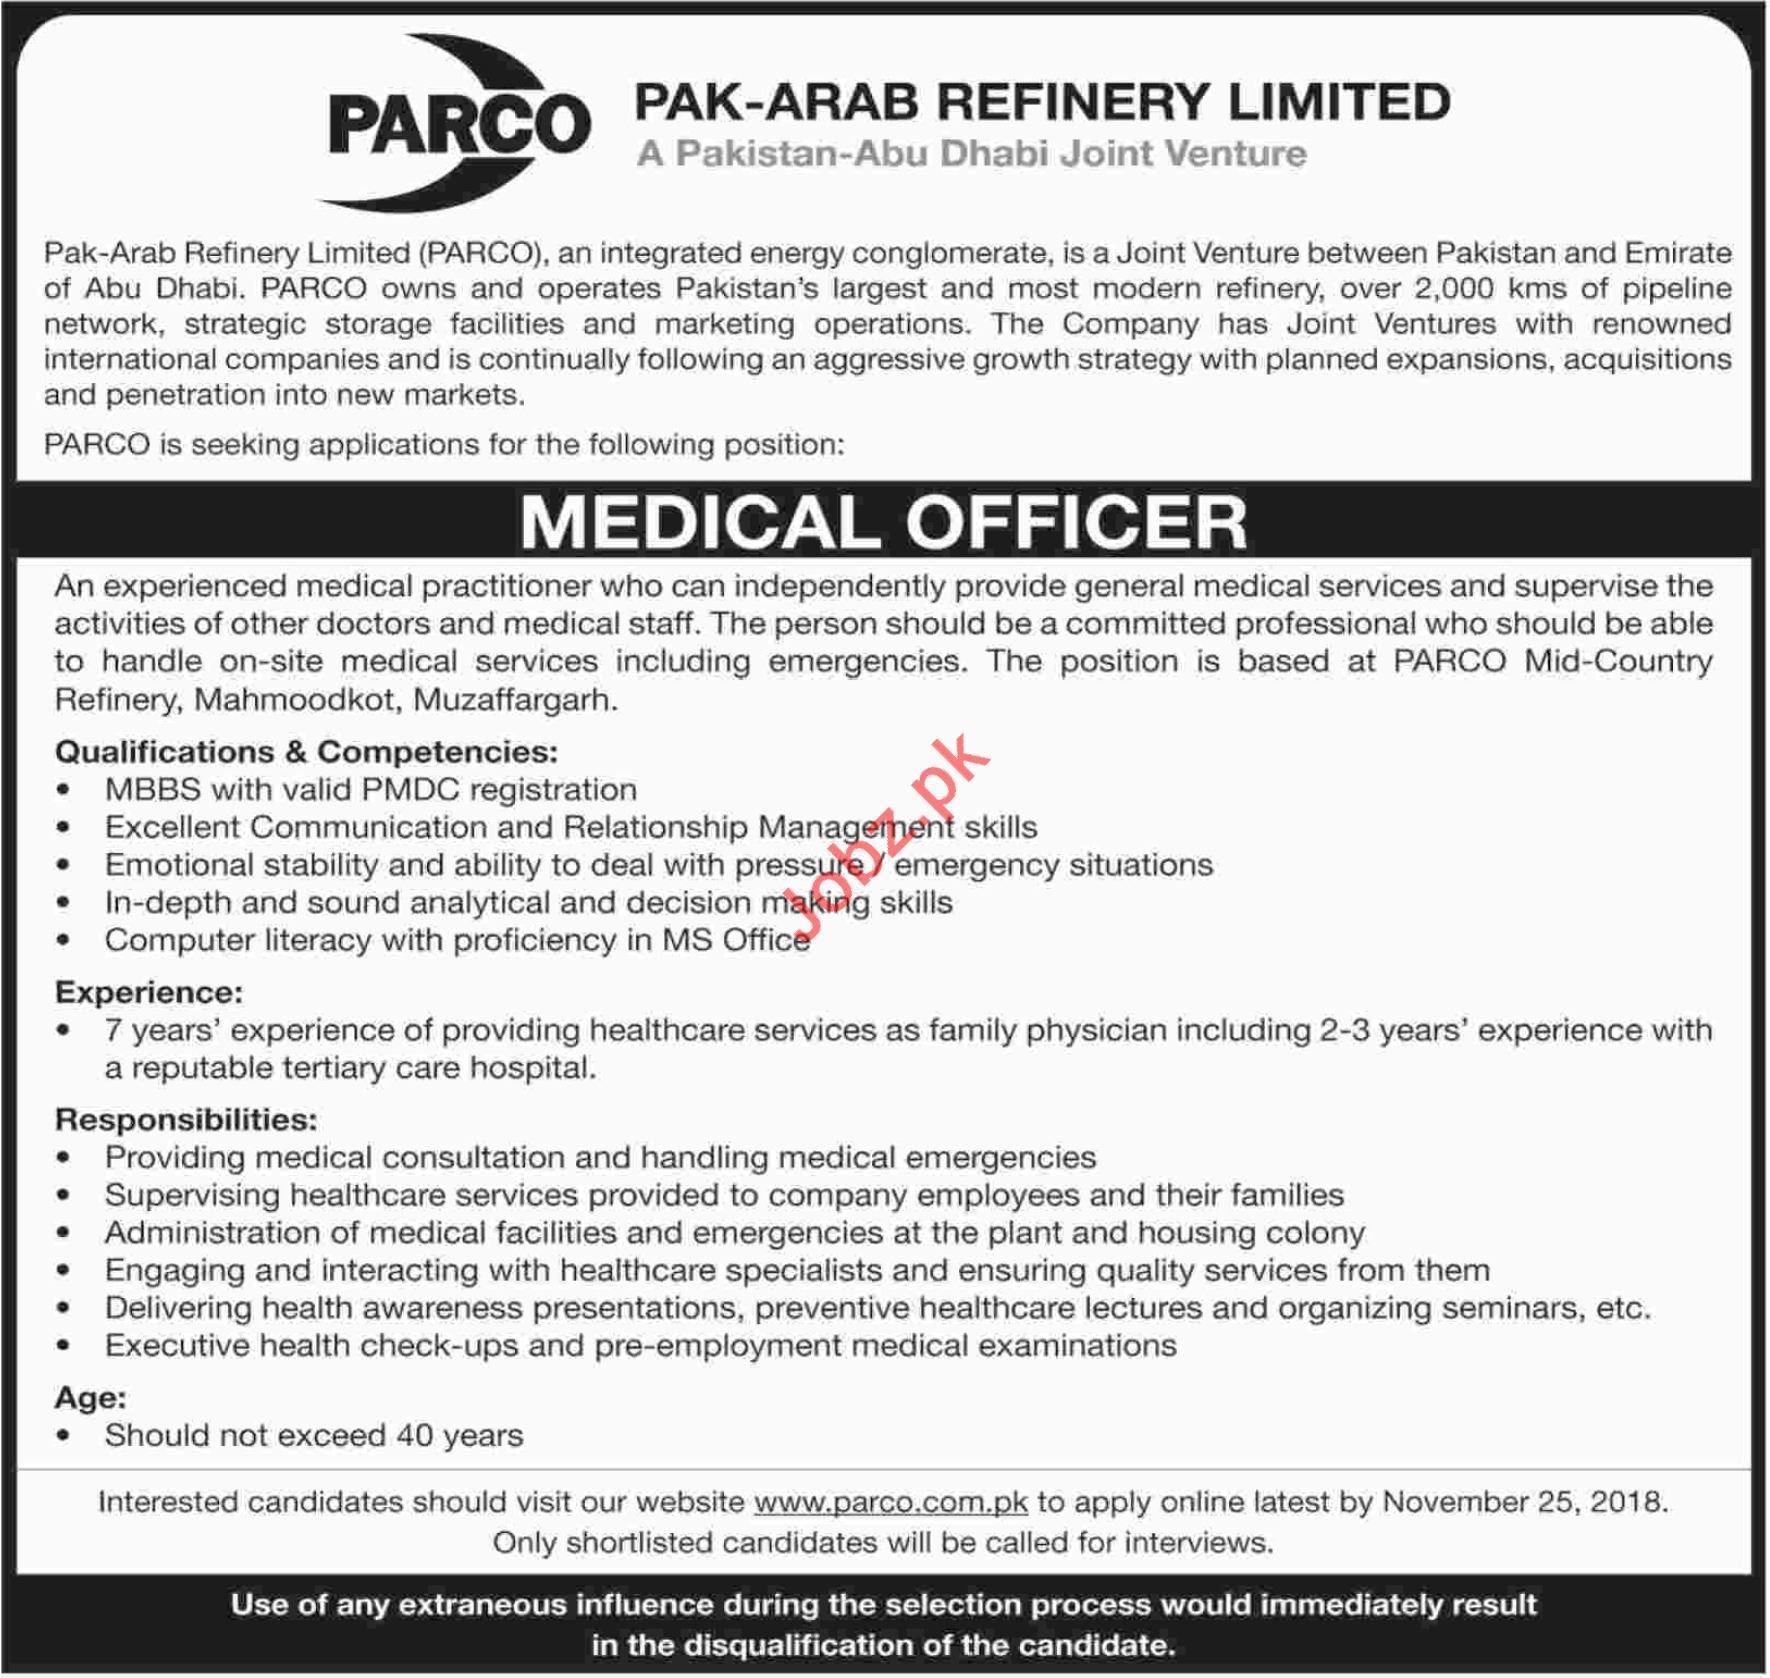 Medical Officer for PARCO